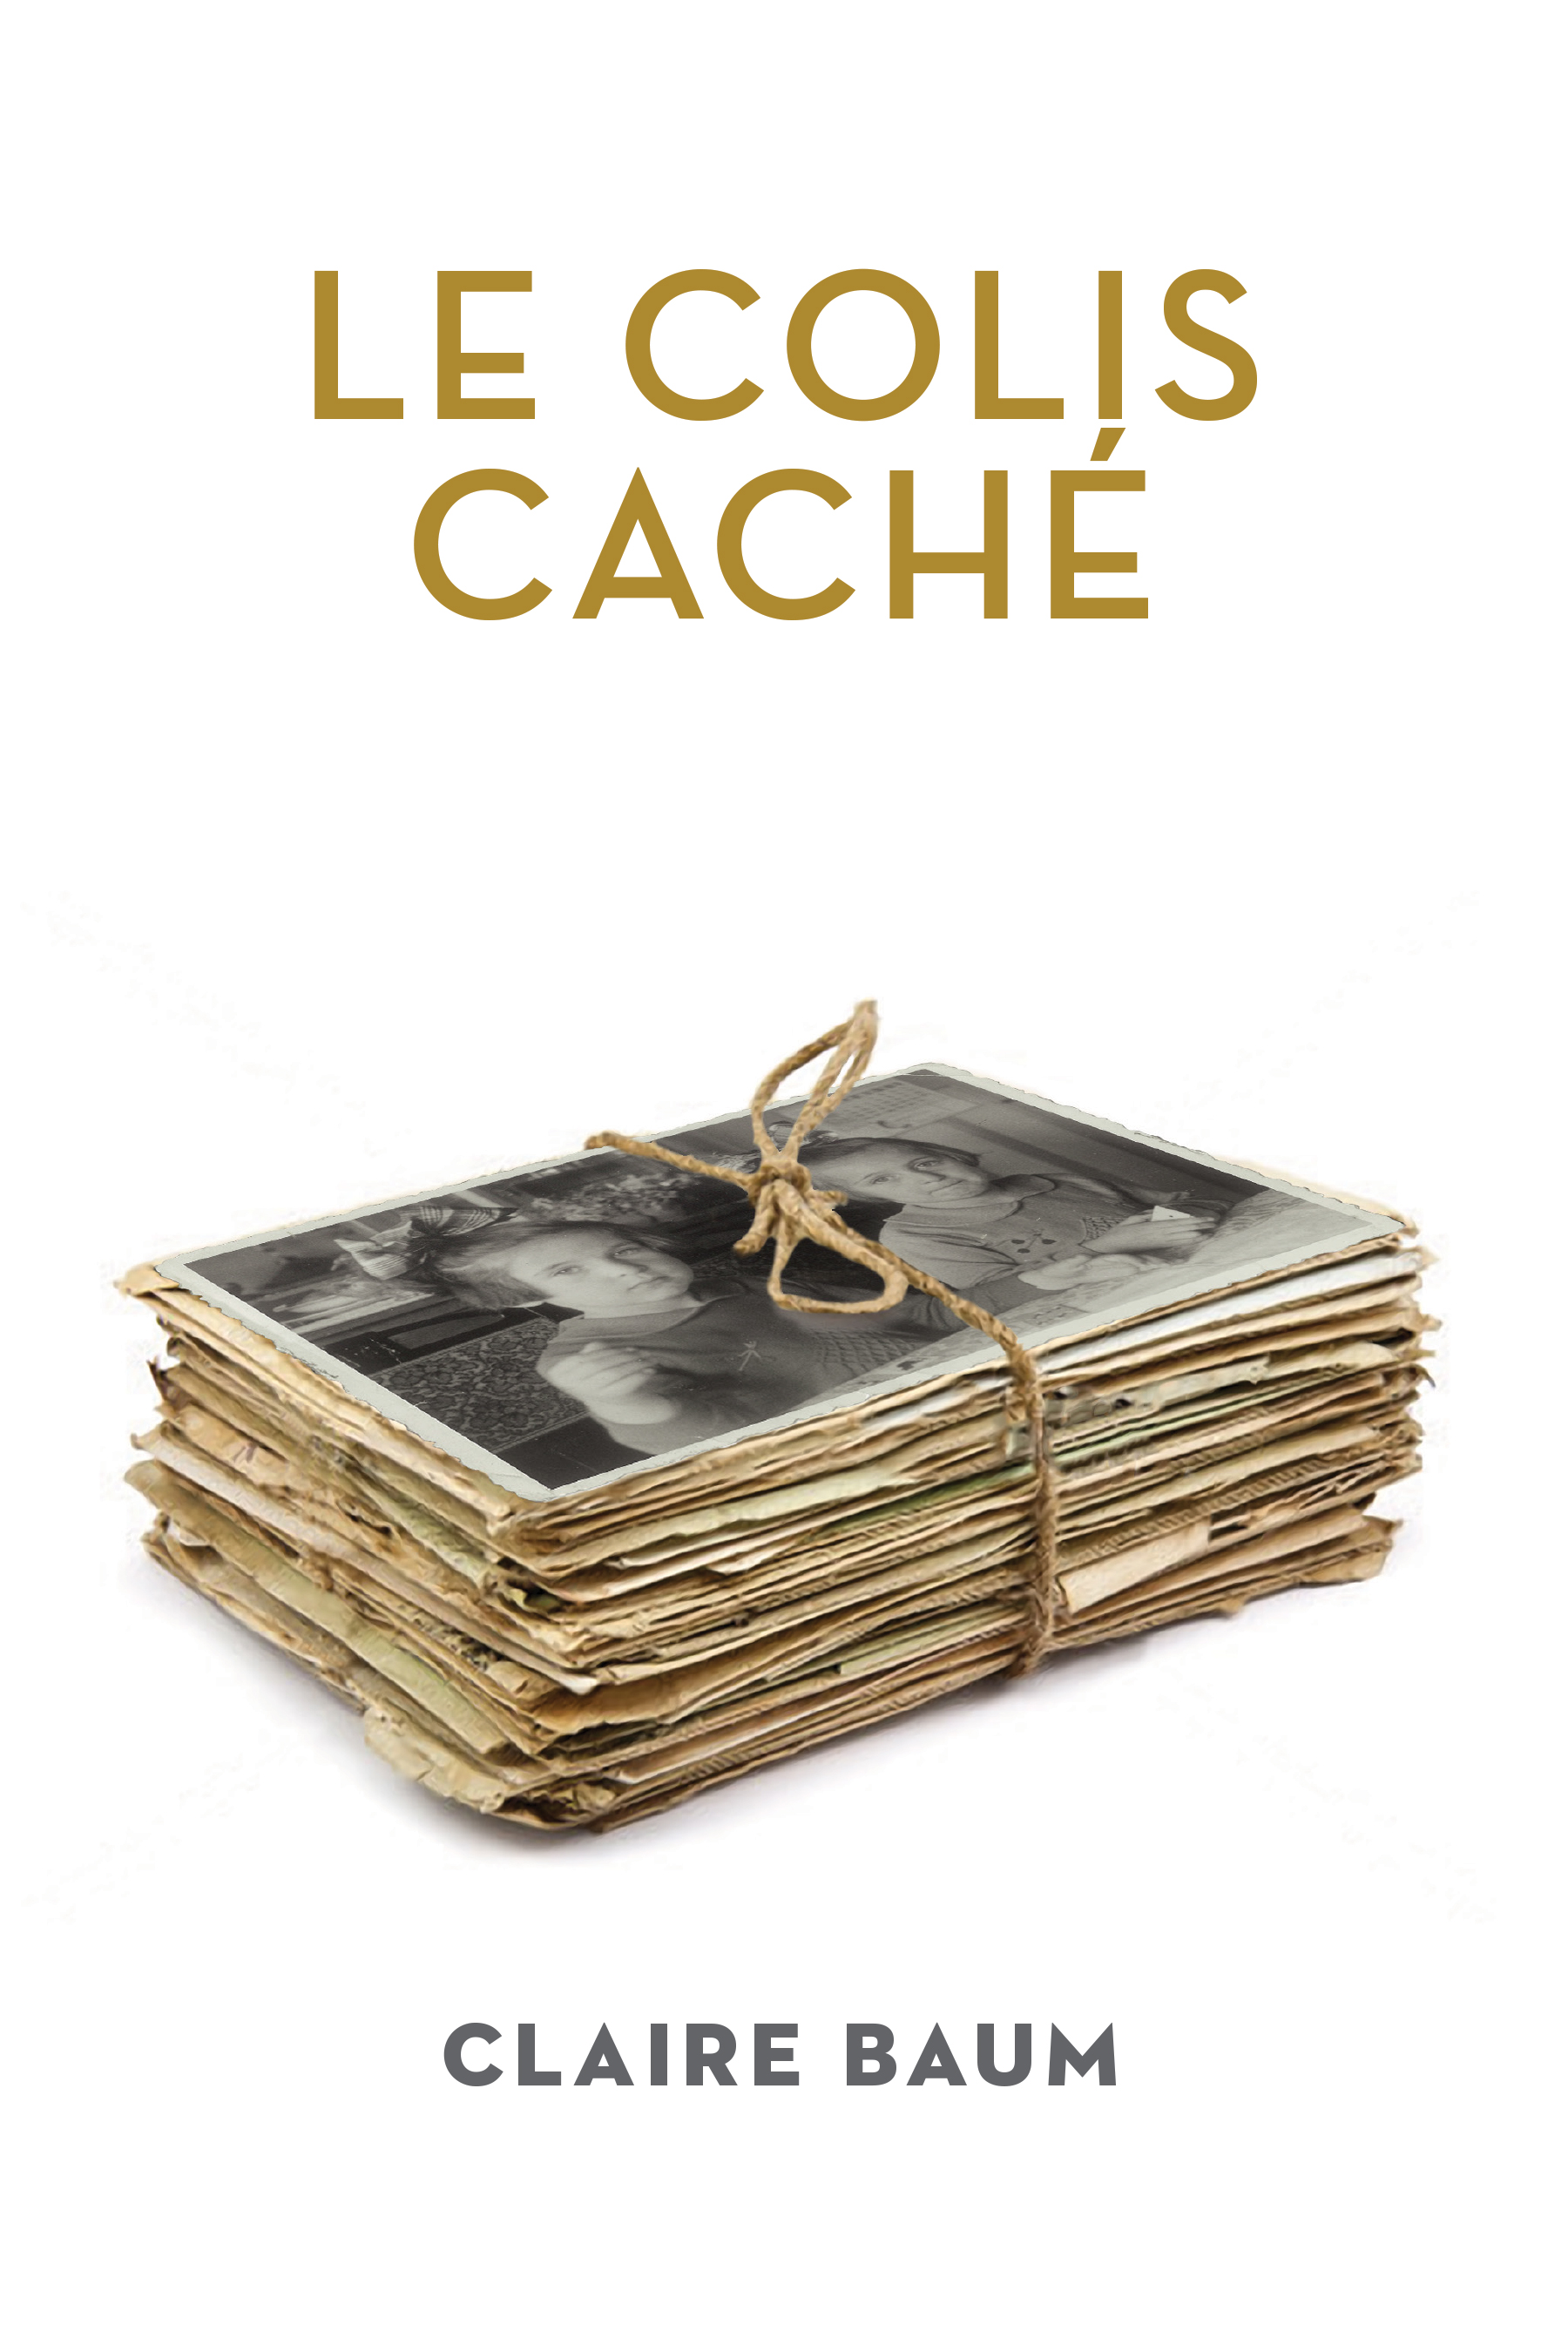 Le Colis caché book cover